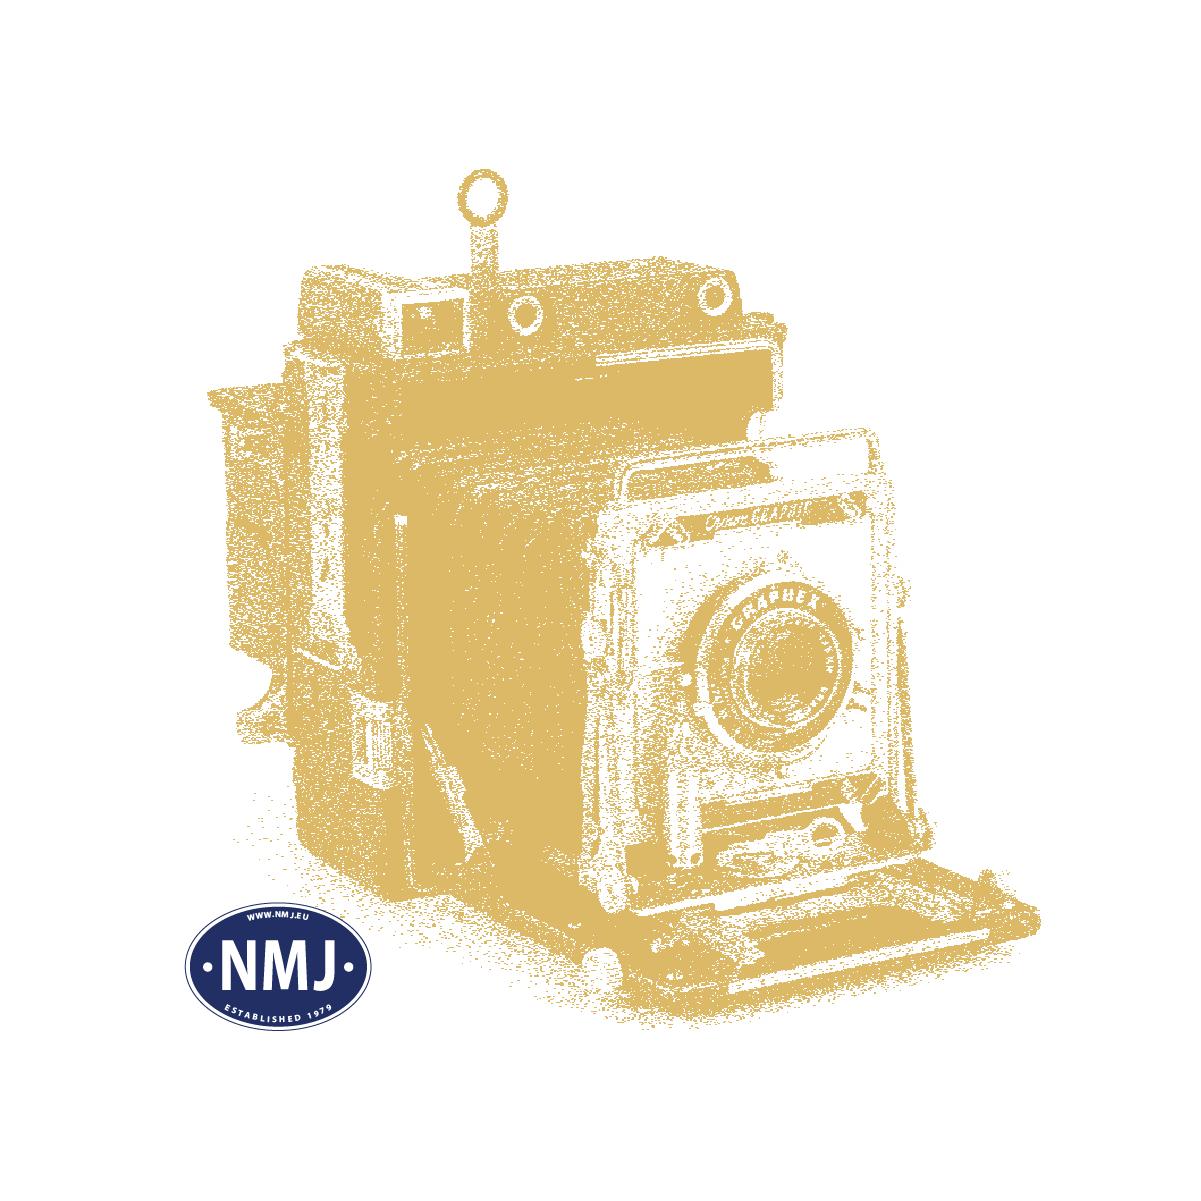 NMJT90018 - NMJ Topline NSB Di3 604, Gammeldesign, DC